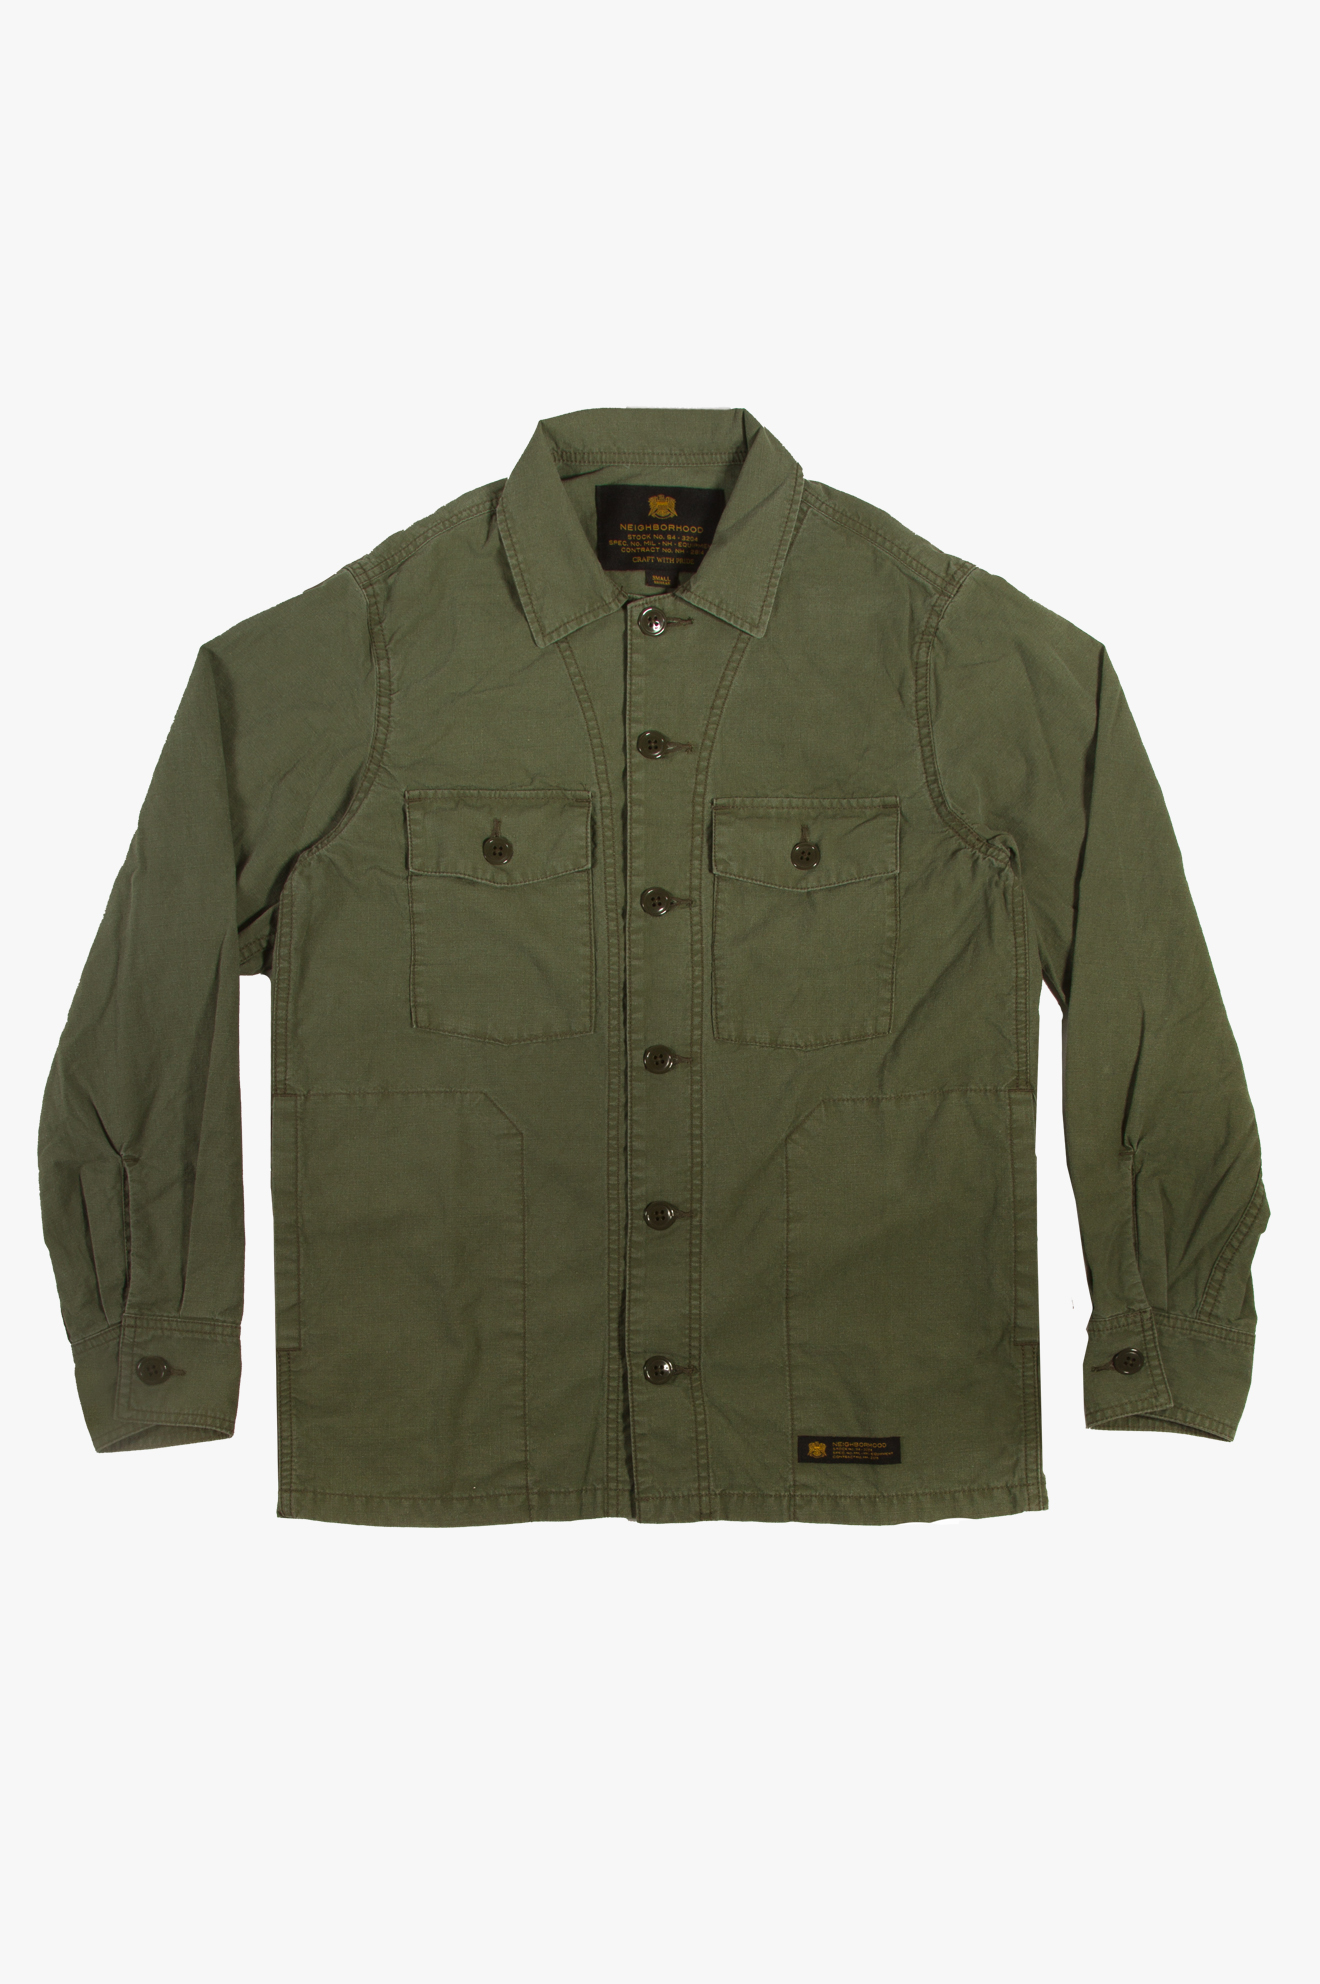 BDU Shirt Olive Drab